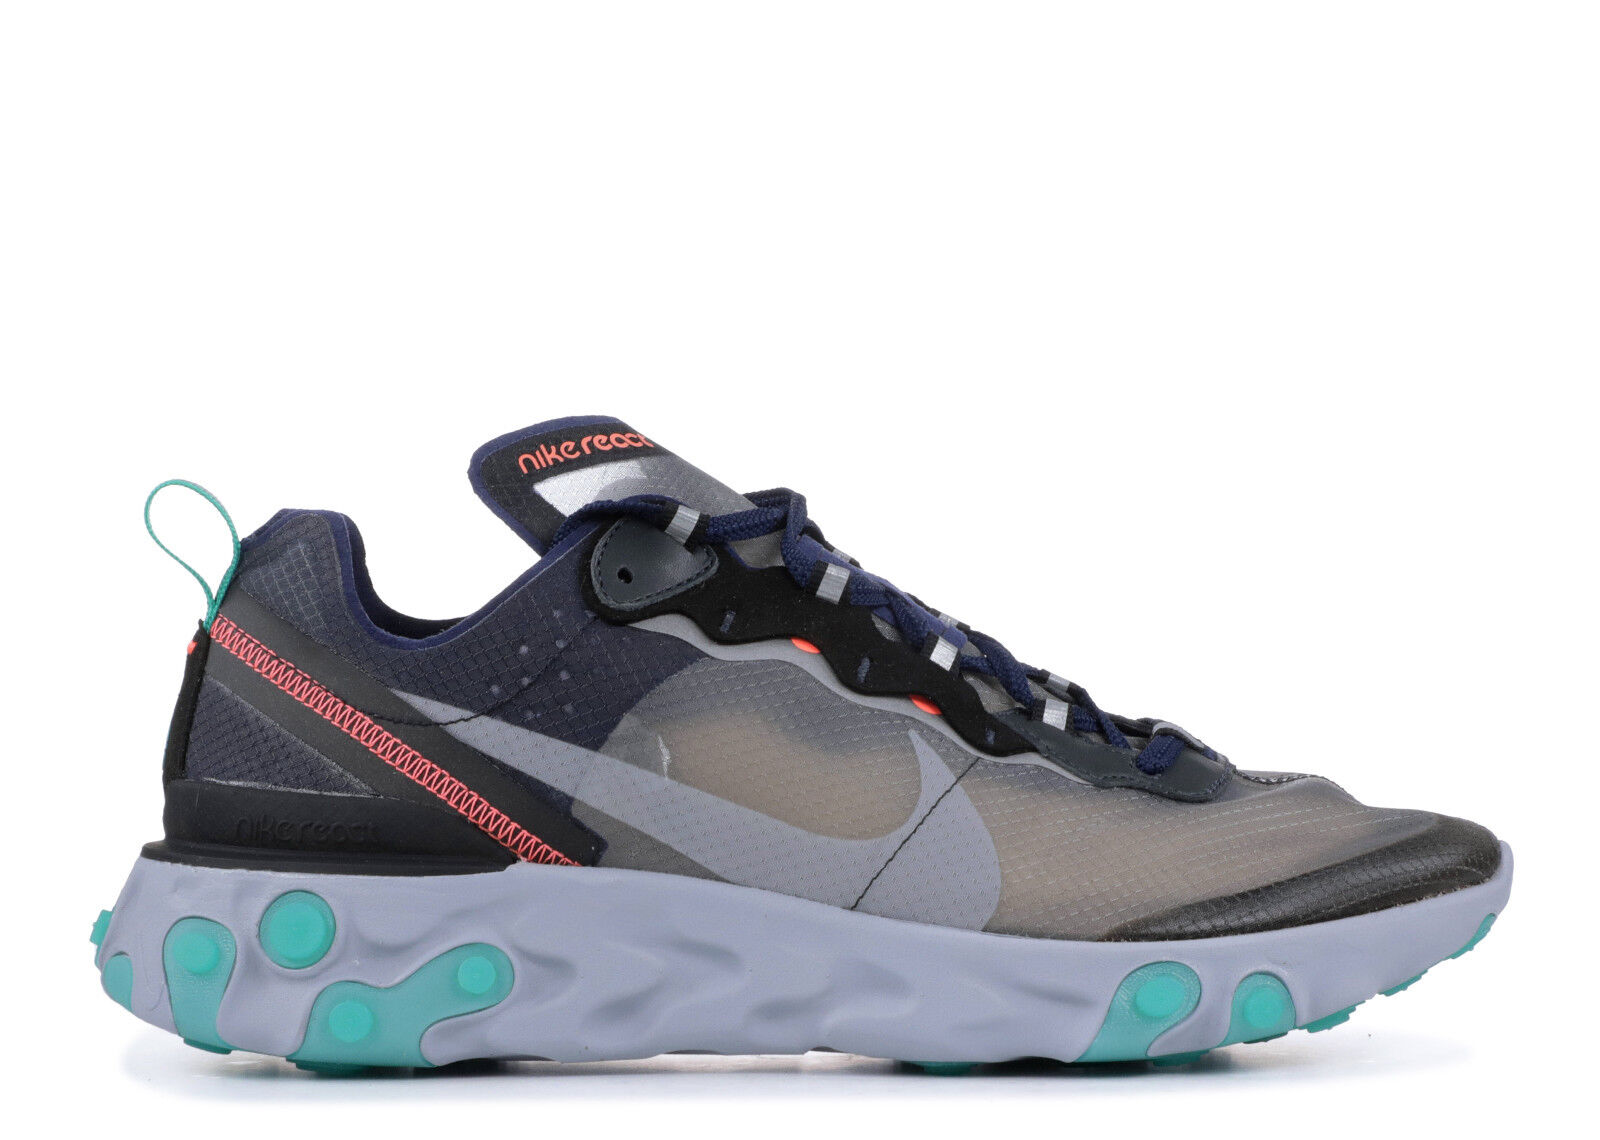 Nike React Element 87 Black Neptune Neptune Neptune Green Size 15. AQ1090-005 vapormax air da7085